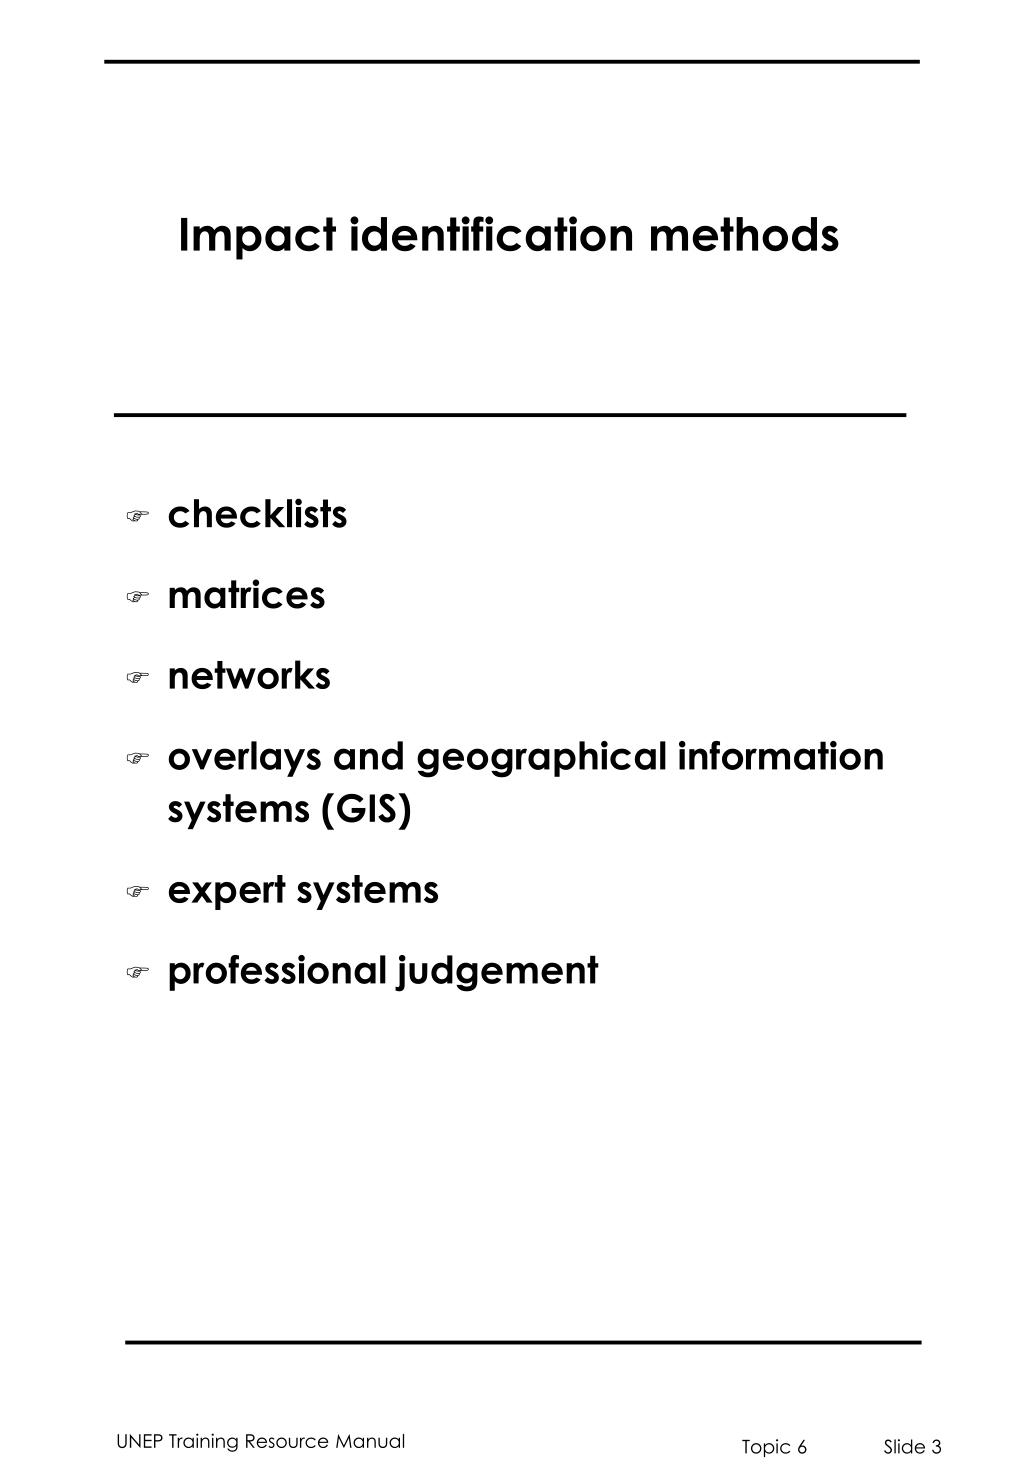 Impact identification methods